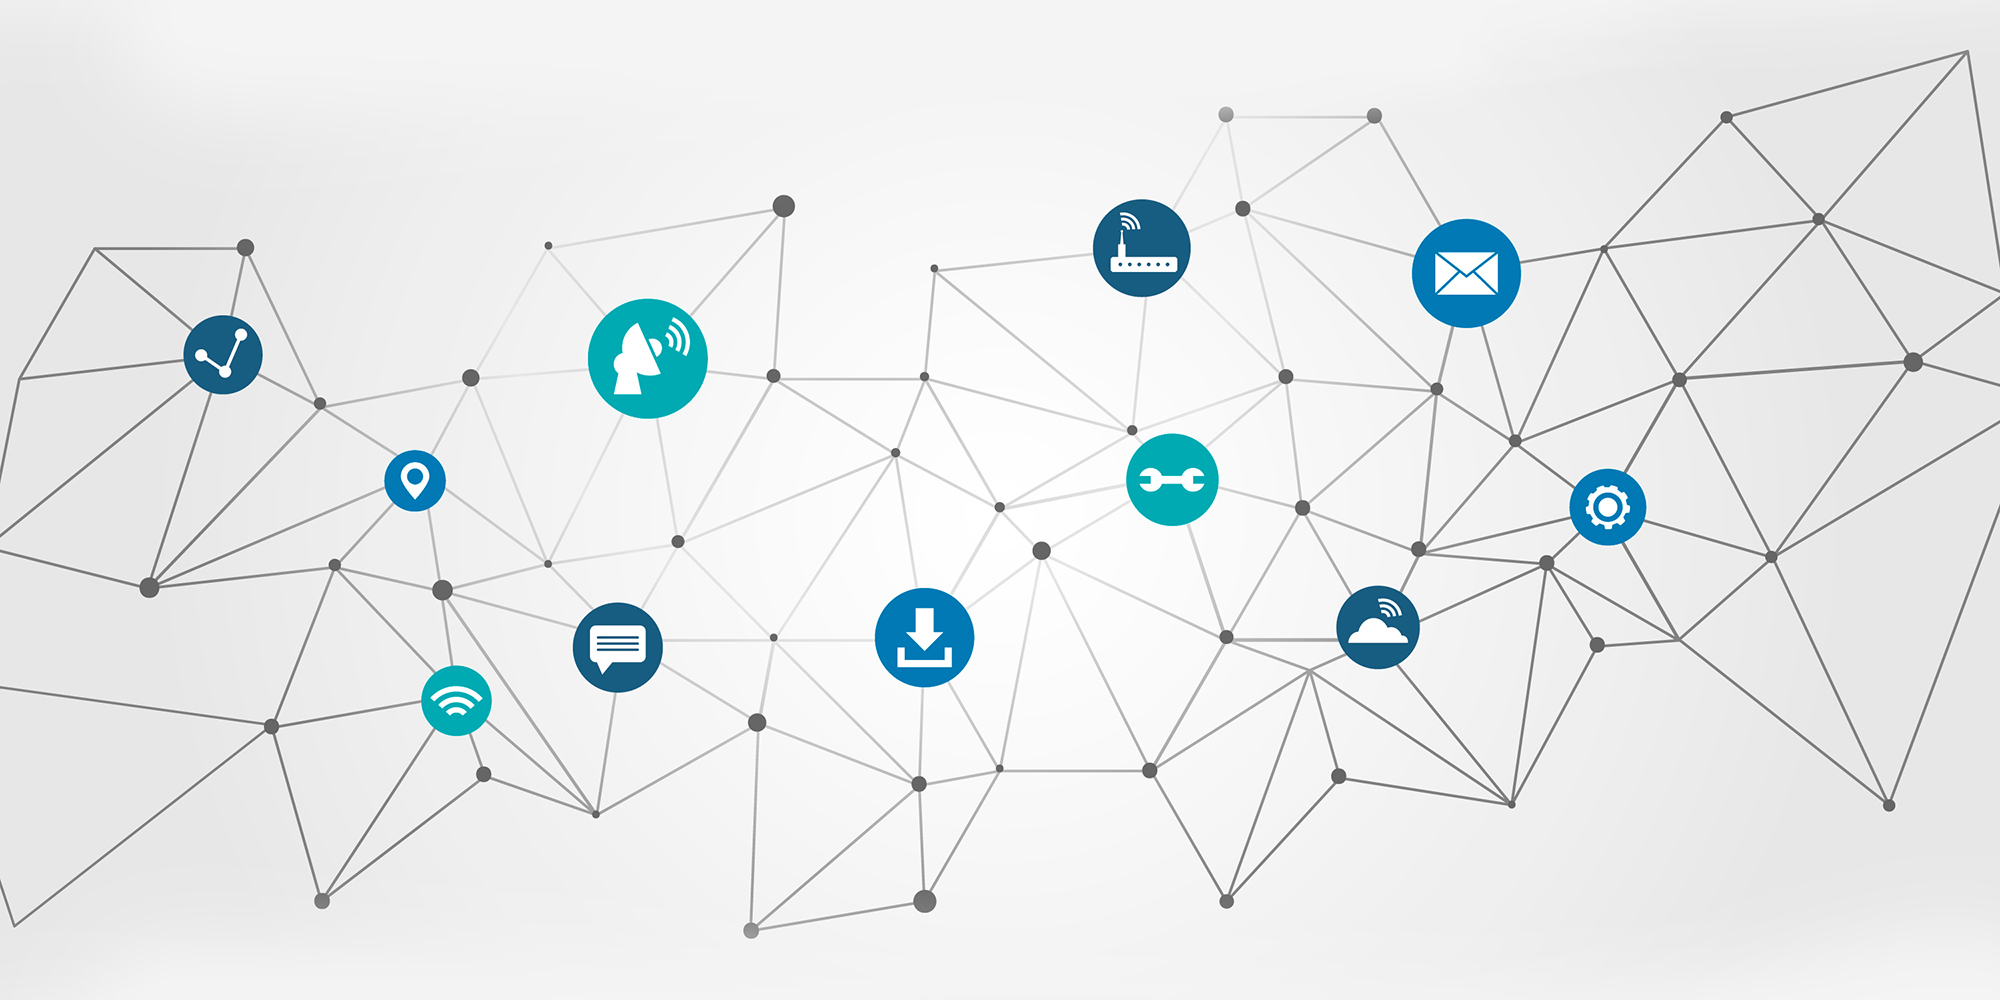 Avviso n. 4/2018 Bando Innovazione Digitale